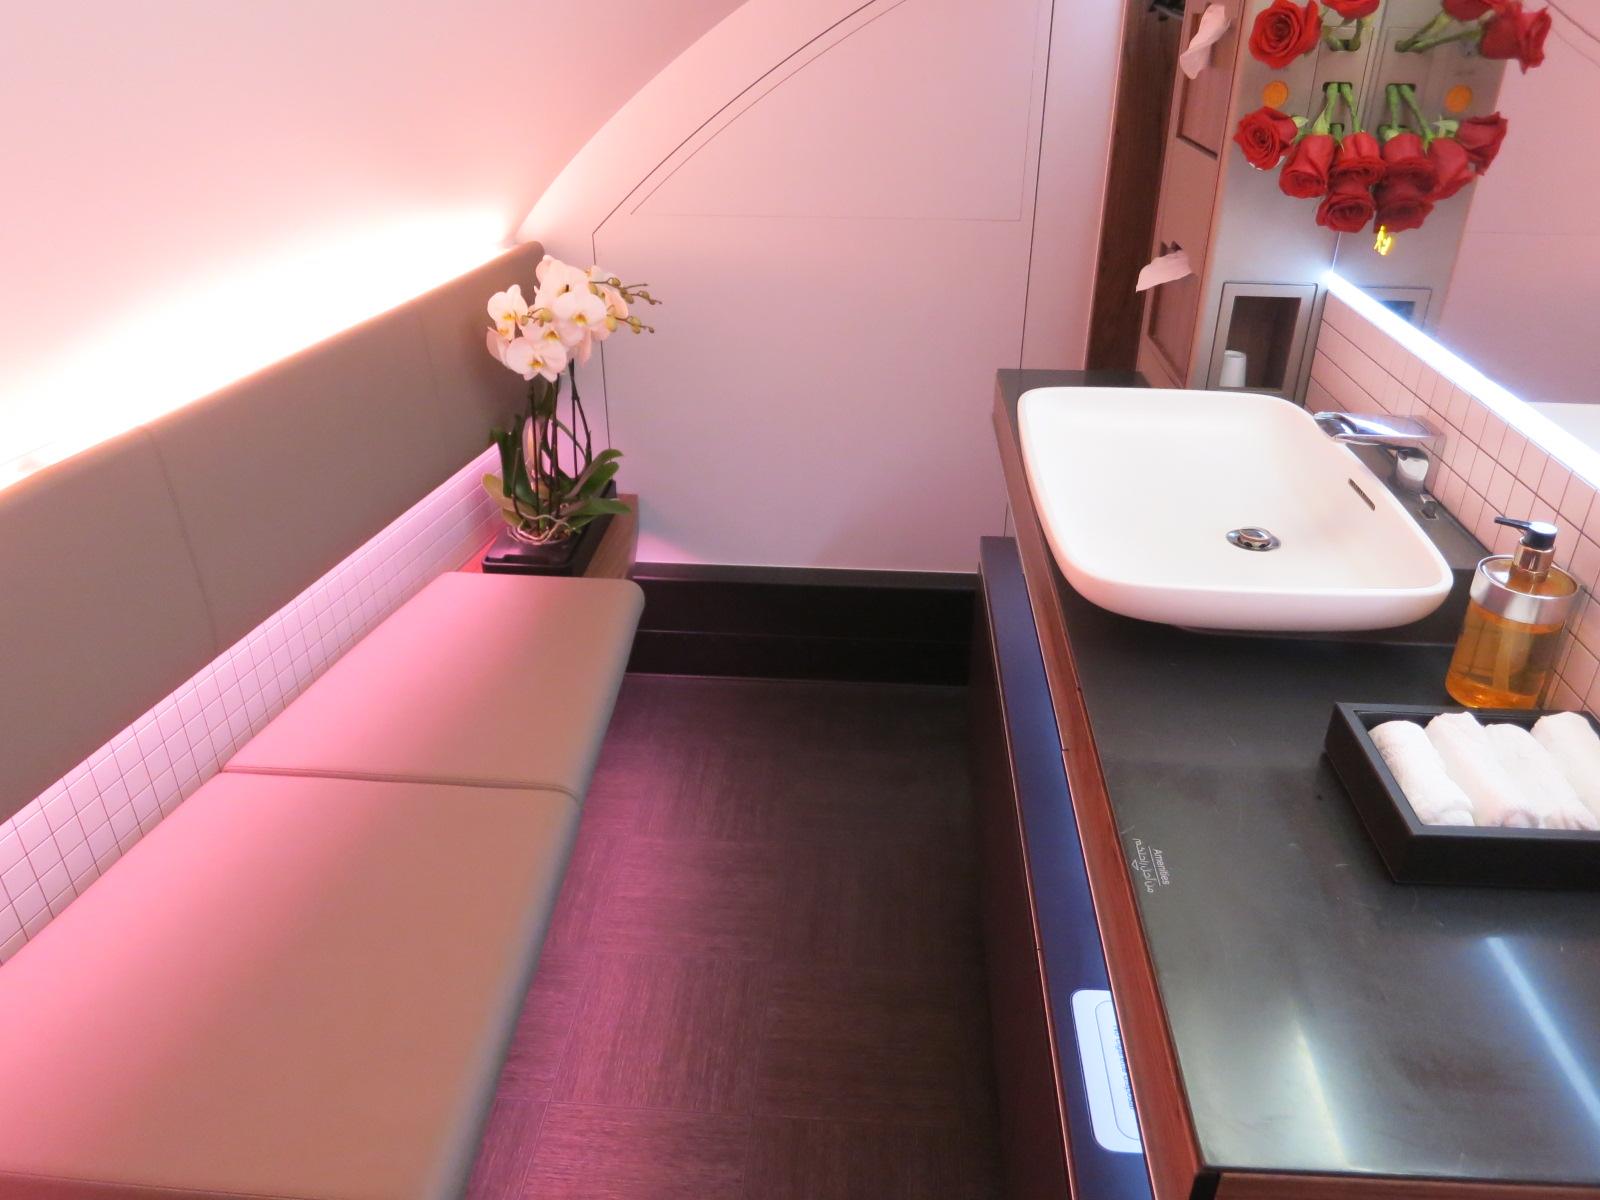 Qatar Airways A380 first class bathroom Bangkok-Doha